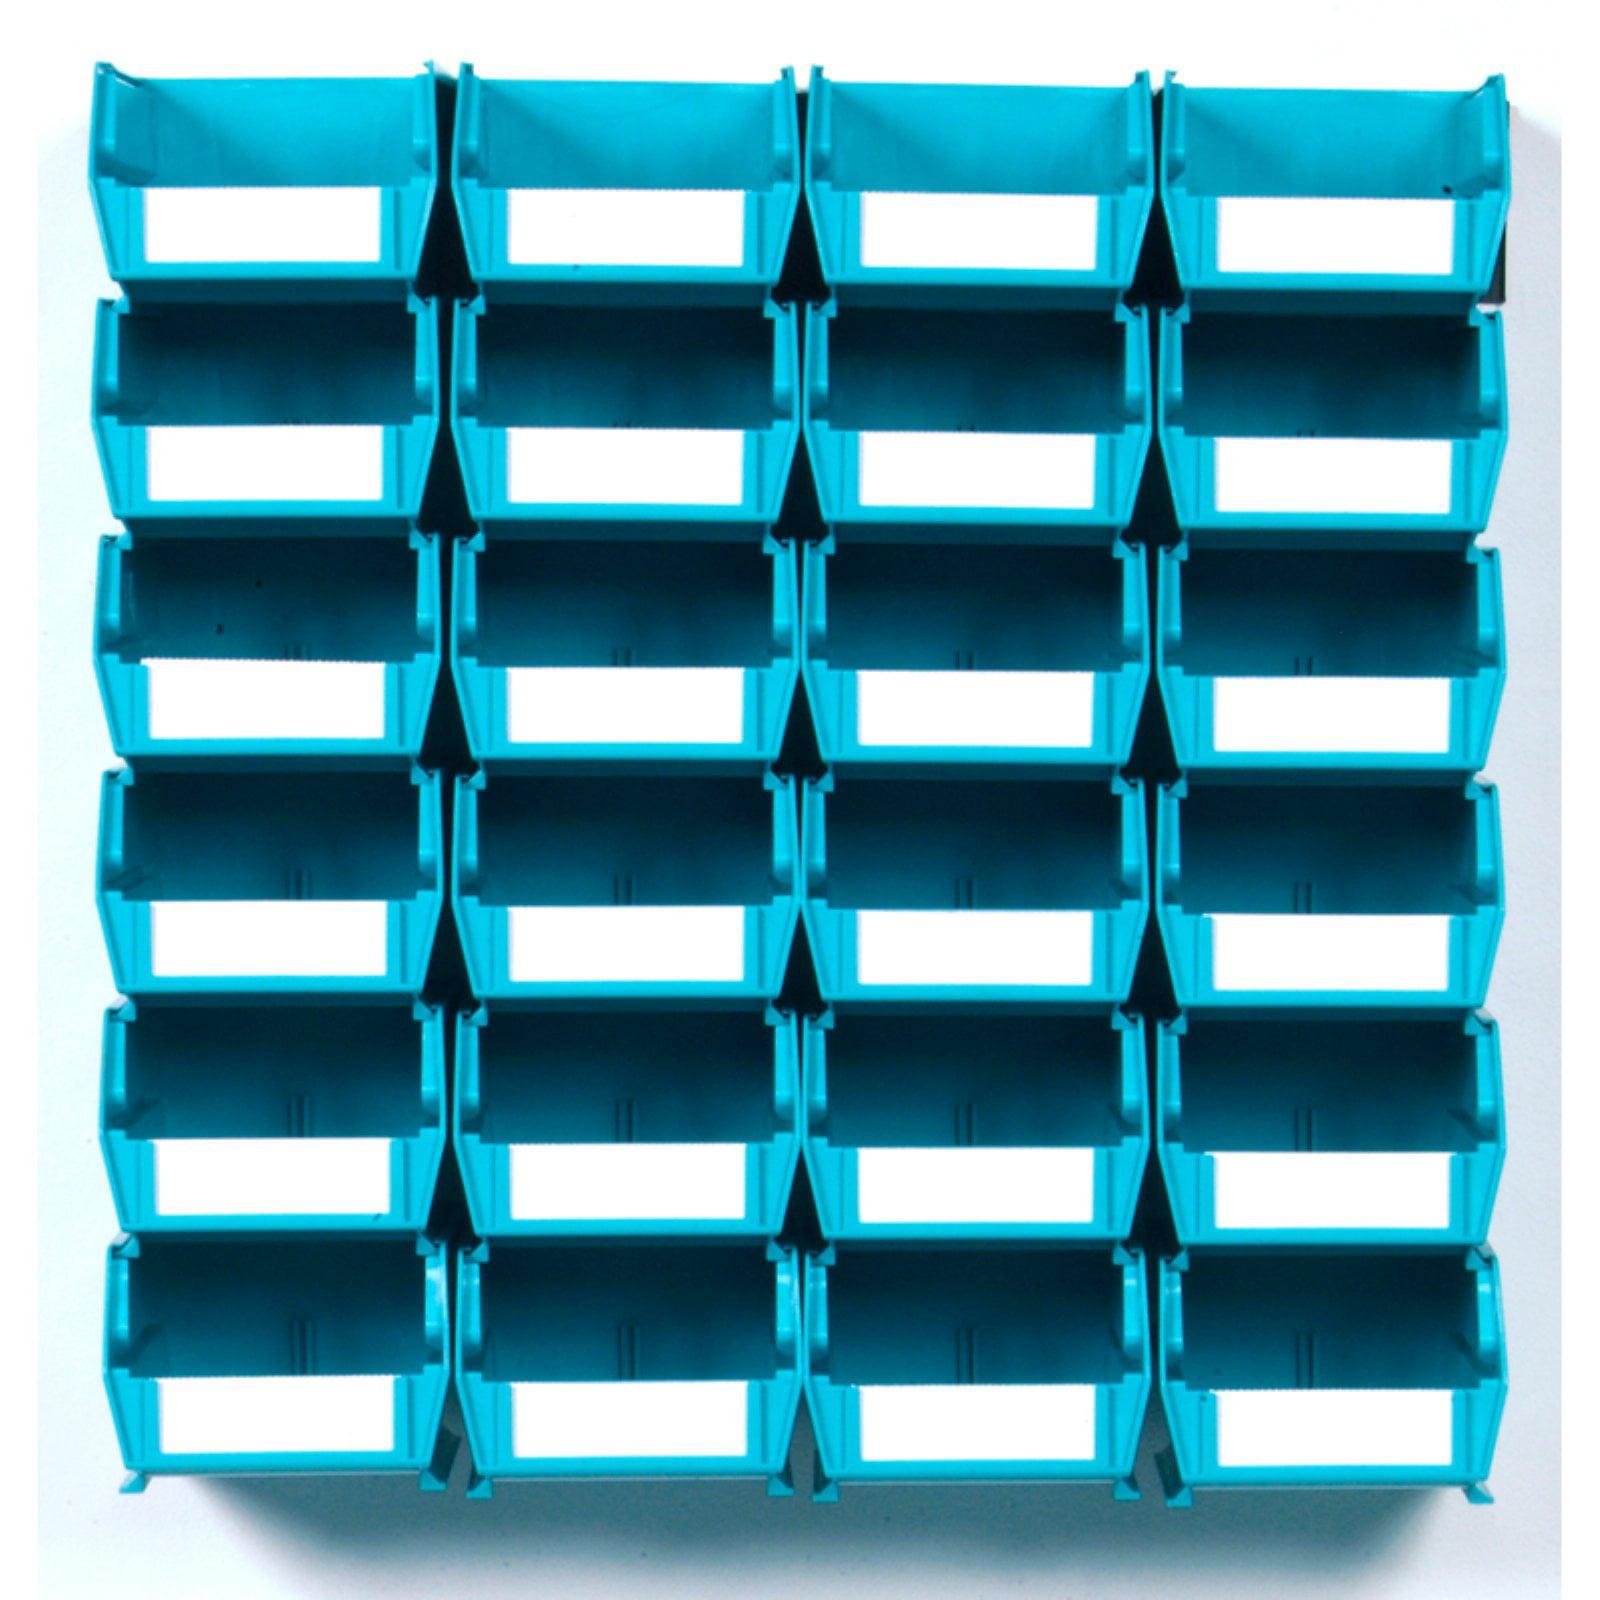 "LocBin 26-Piece Wall Storage Unit with 5-3/8""L x 4-1/8""W x 3""H Interlocking Poly Bins, 24ct, Wall Mount Rails 8-3/4""L with Hardware, 2pk"